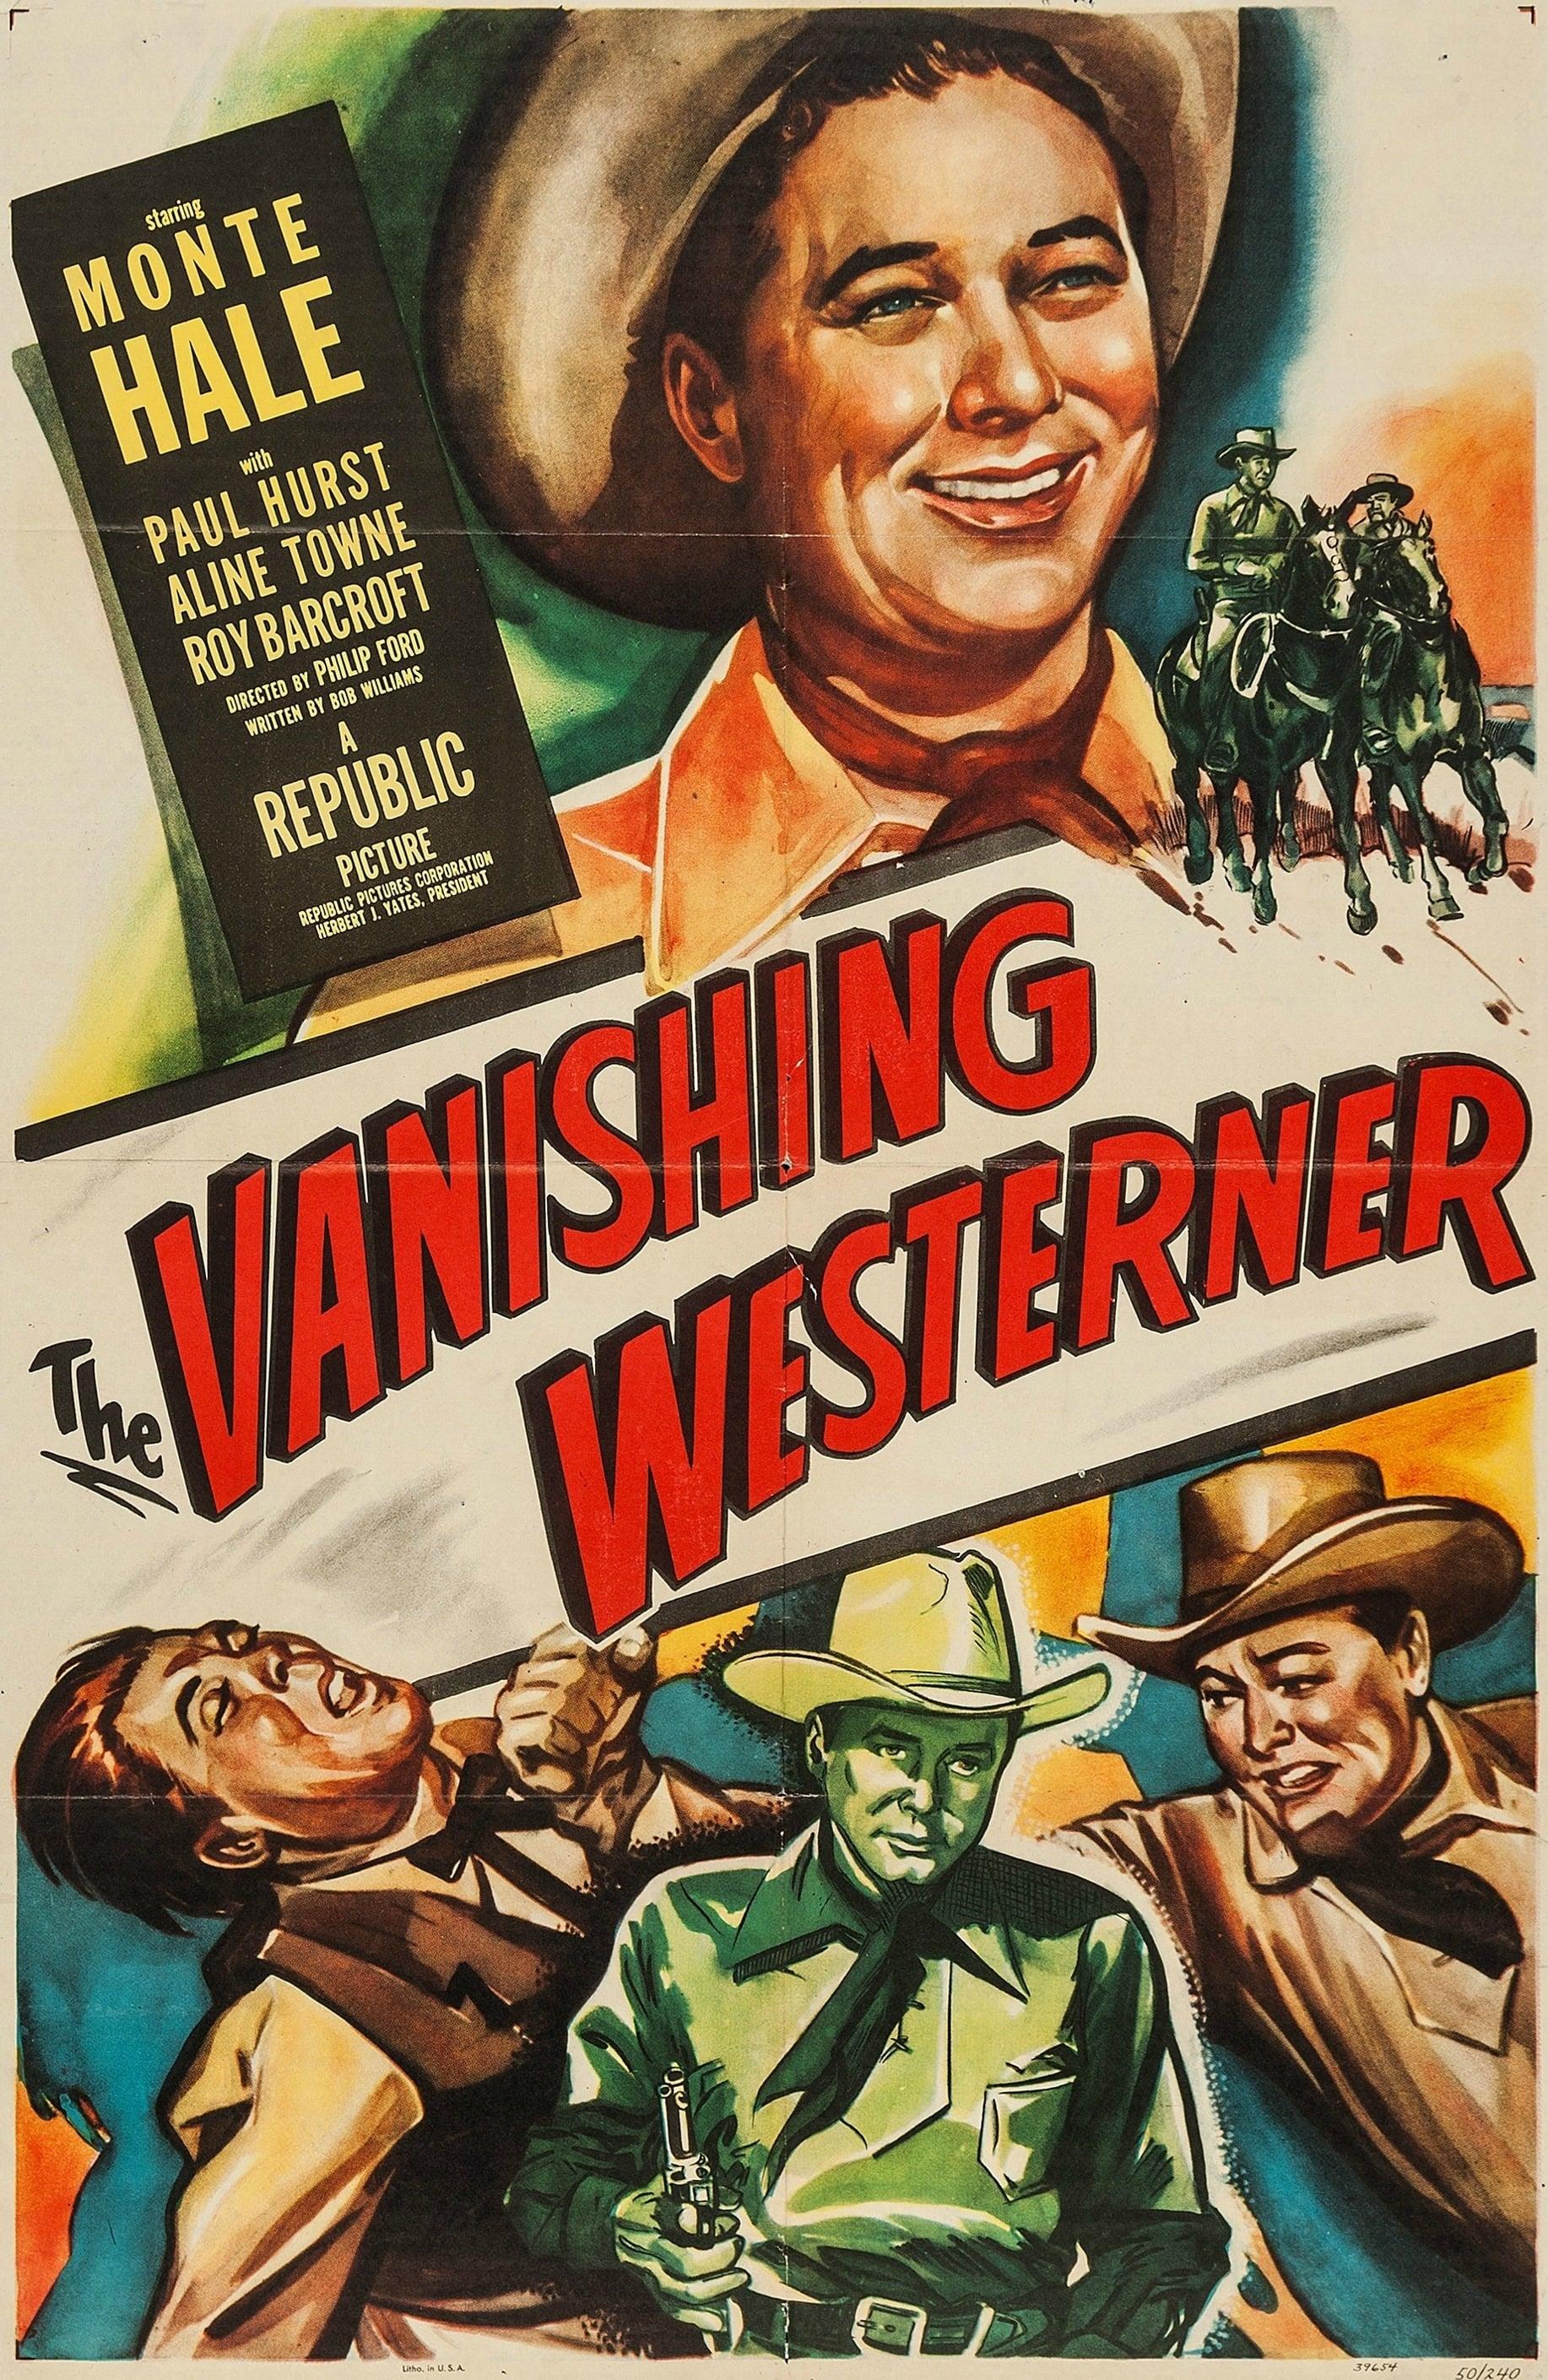 The Vanishing Westerner (1950)